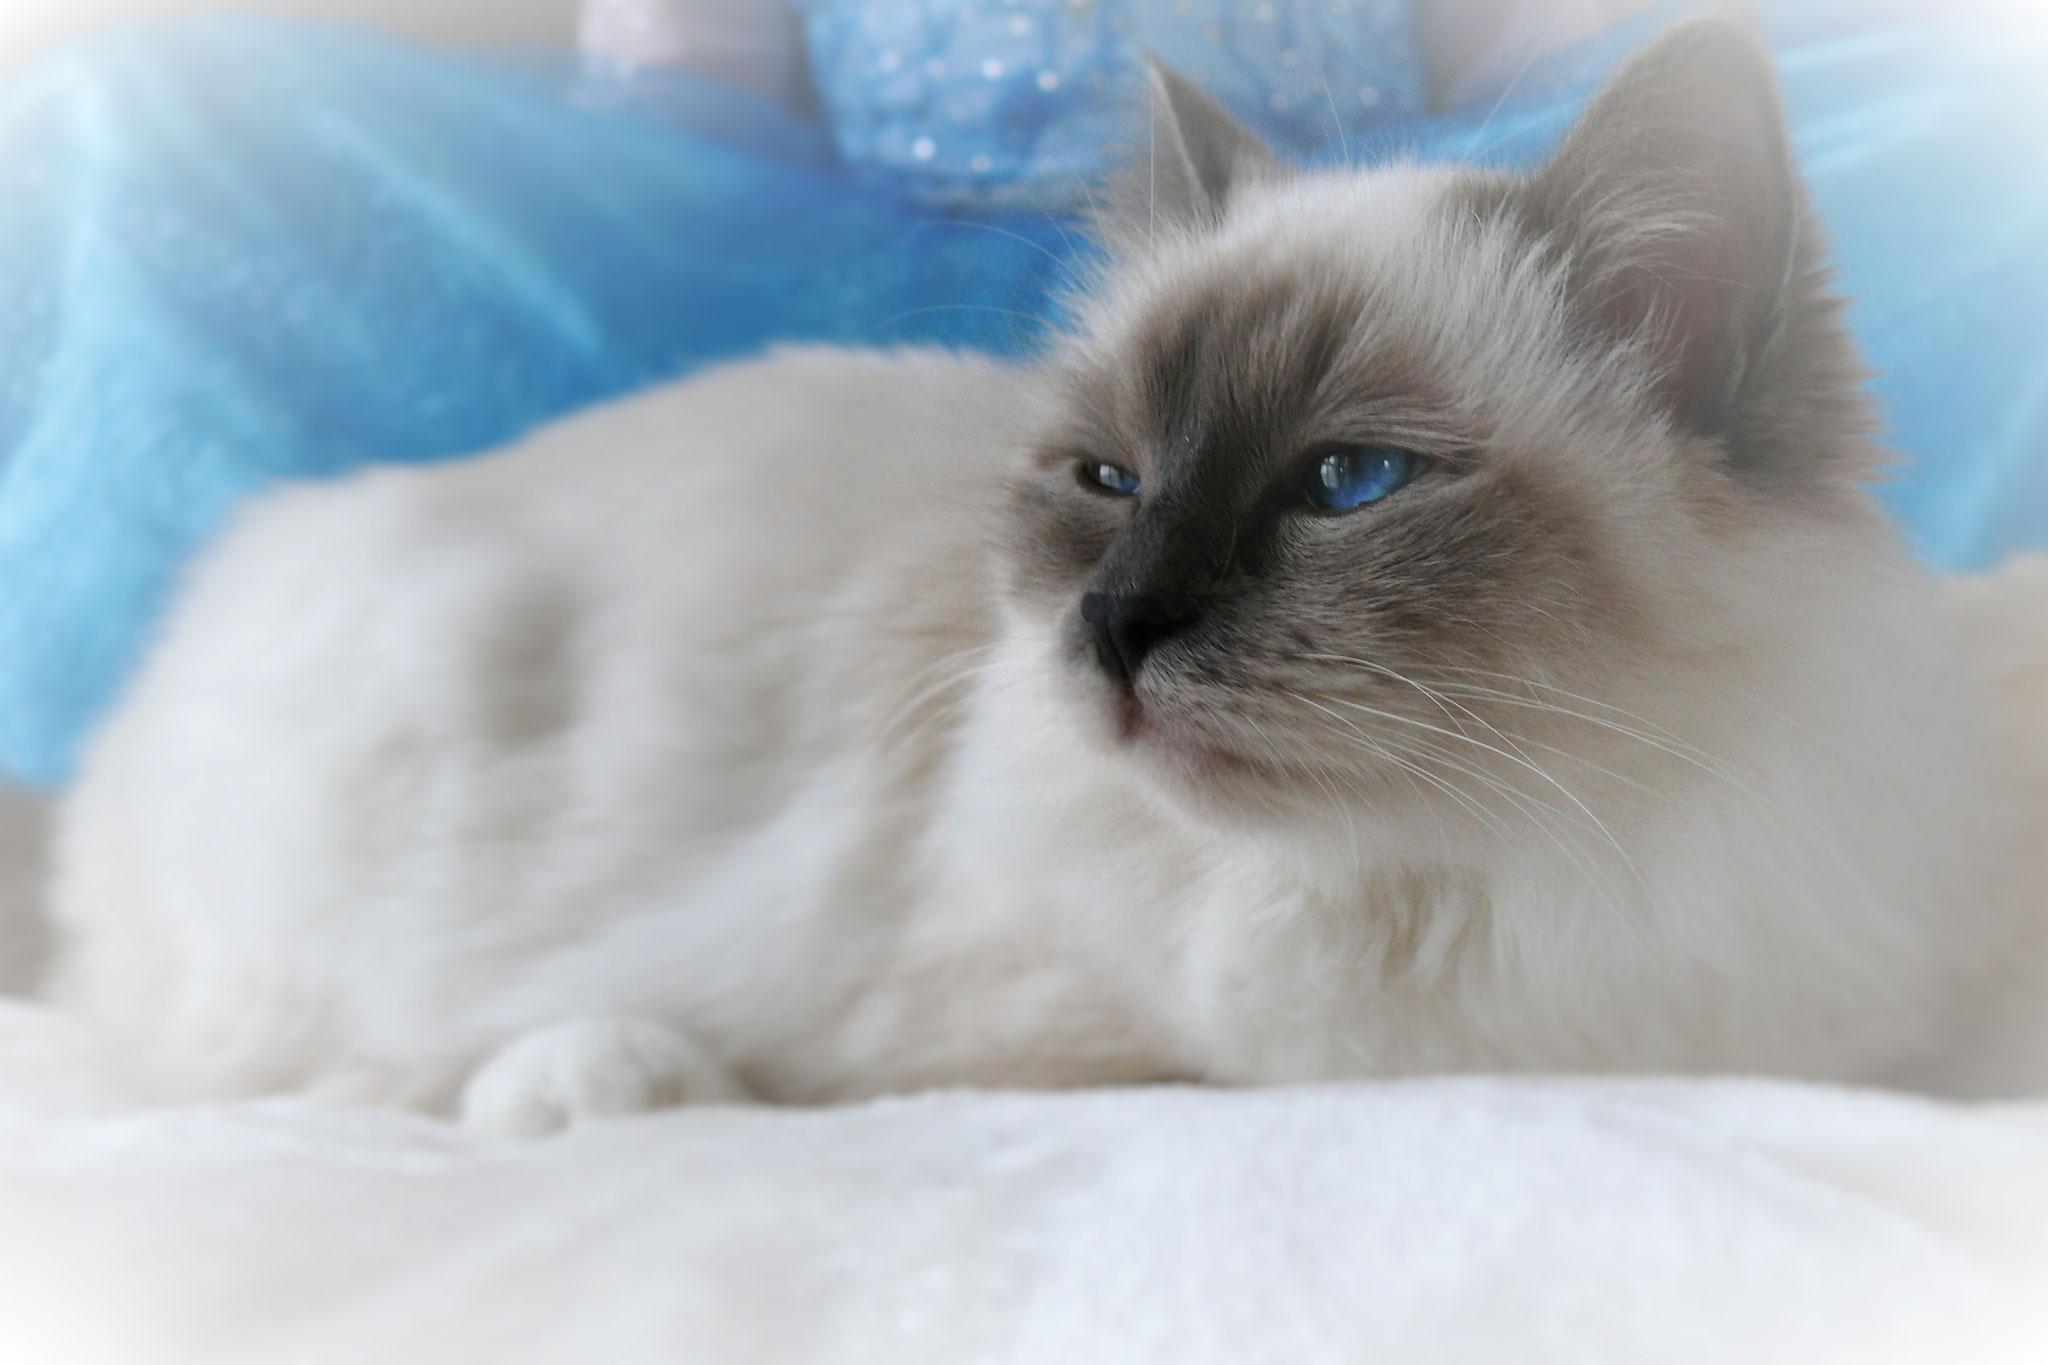 Tamia vom Lilienweg, 8 Monate alt